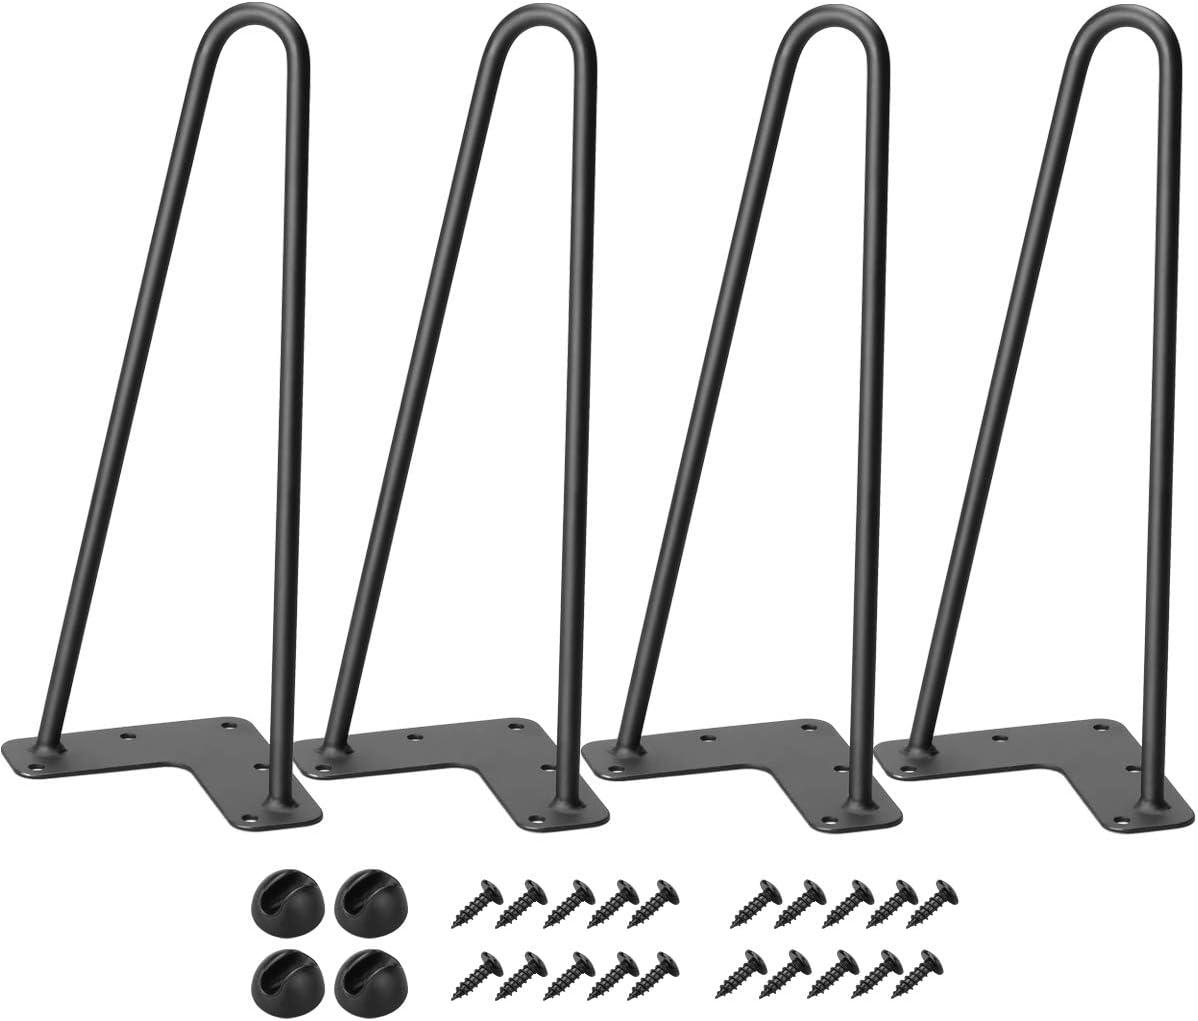 "TE DEUM 12 Inch Satin Black Hairpin Legs (Set of 4 Heavy Duty 2 Rods Legs), 3/8"" Diameter, Metal Heavy Duty Mid-Century Modern,Coffee Table Legs …"